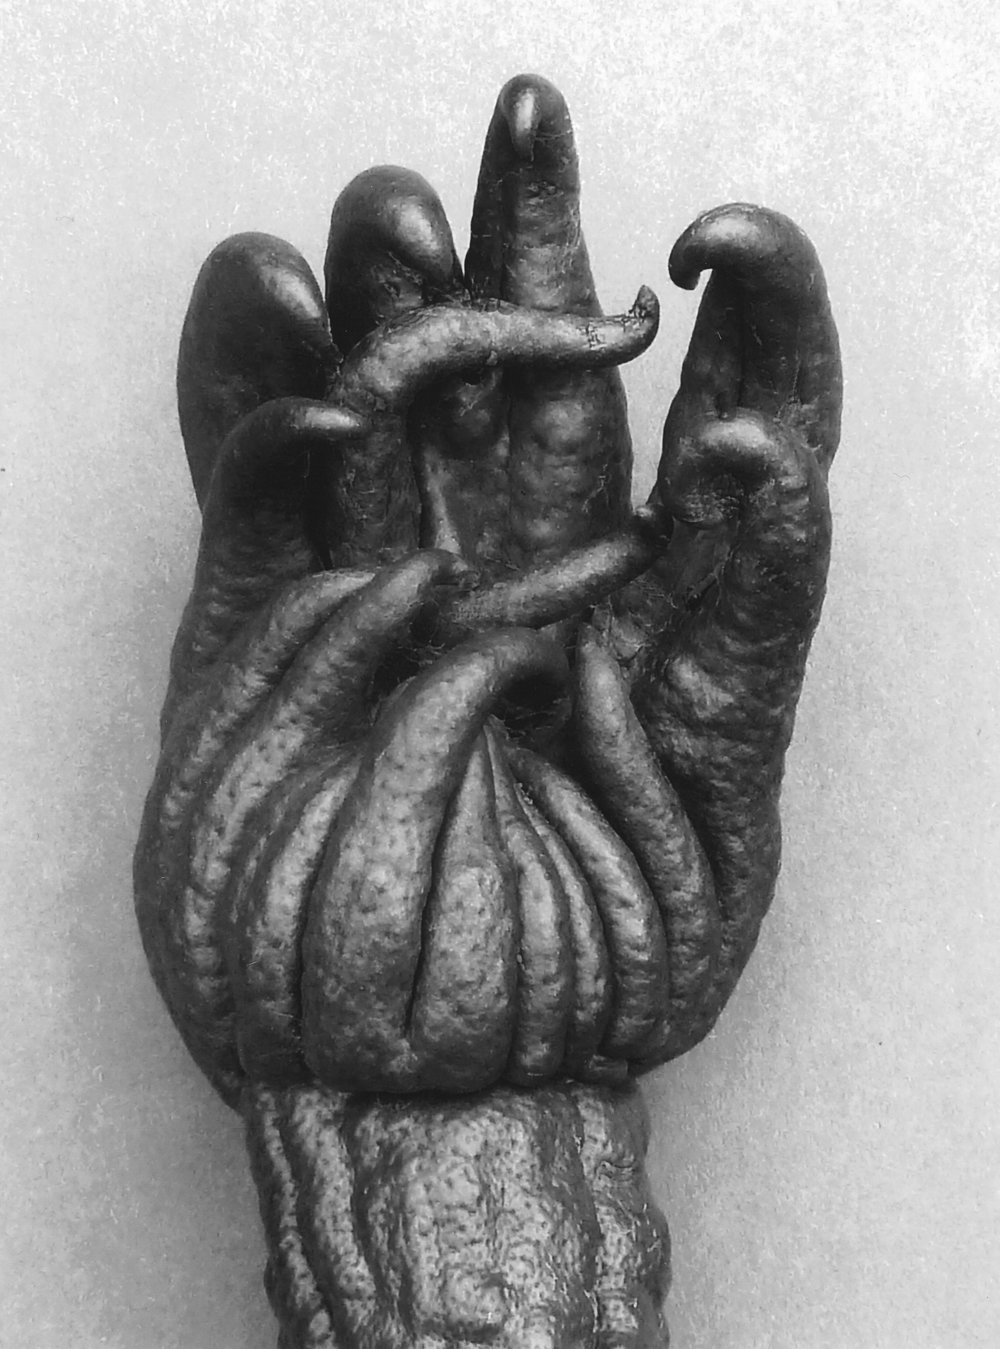 Peter Peryer , Buddha's Hand , 2012. Digital print. Image courtesy of the artist.